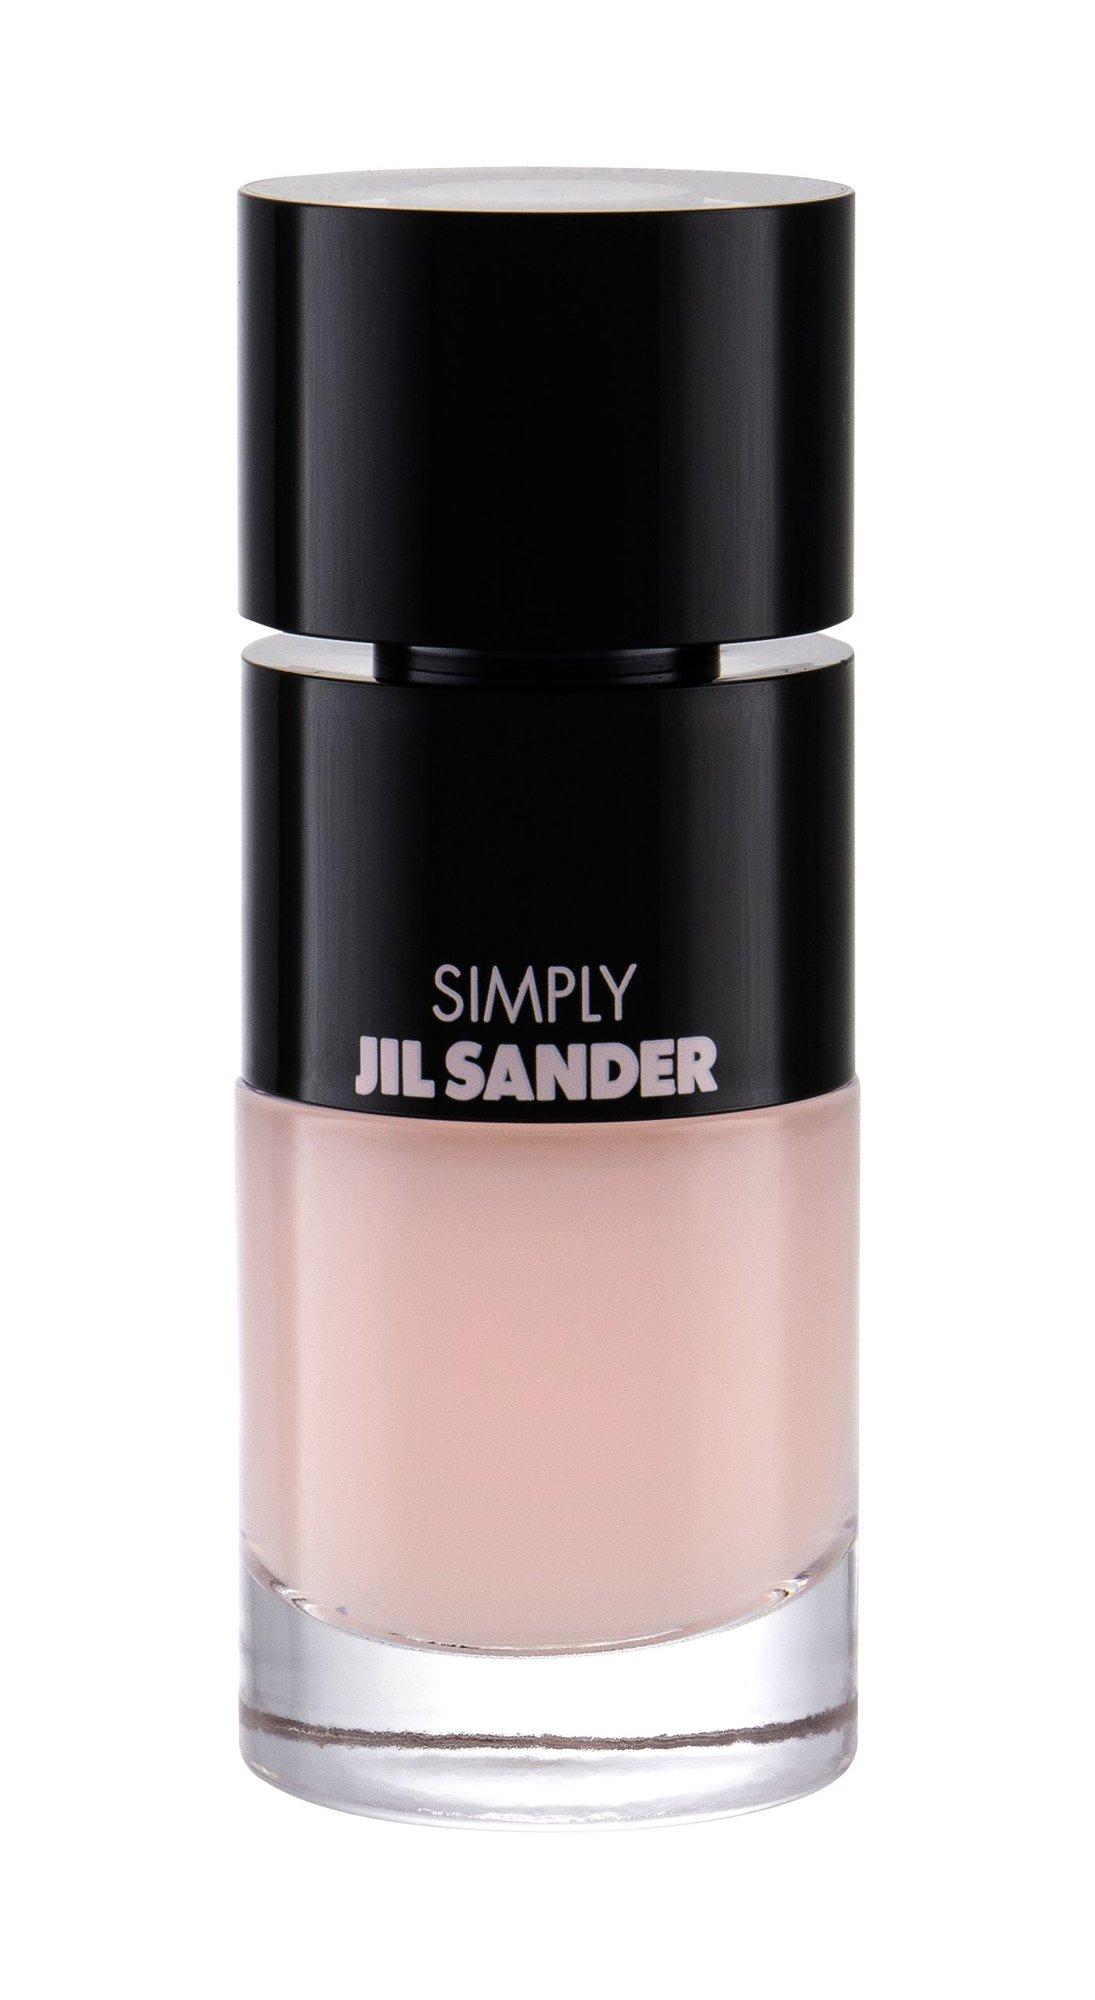 Jil Sander Simply Jil Sander Eau de Parfum 60ml